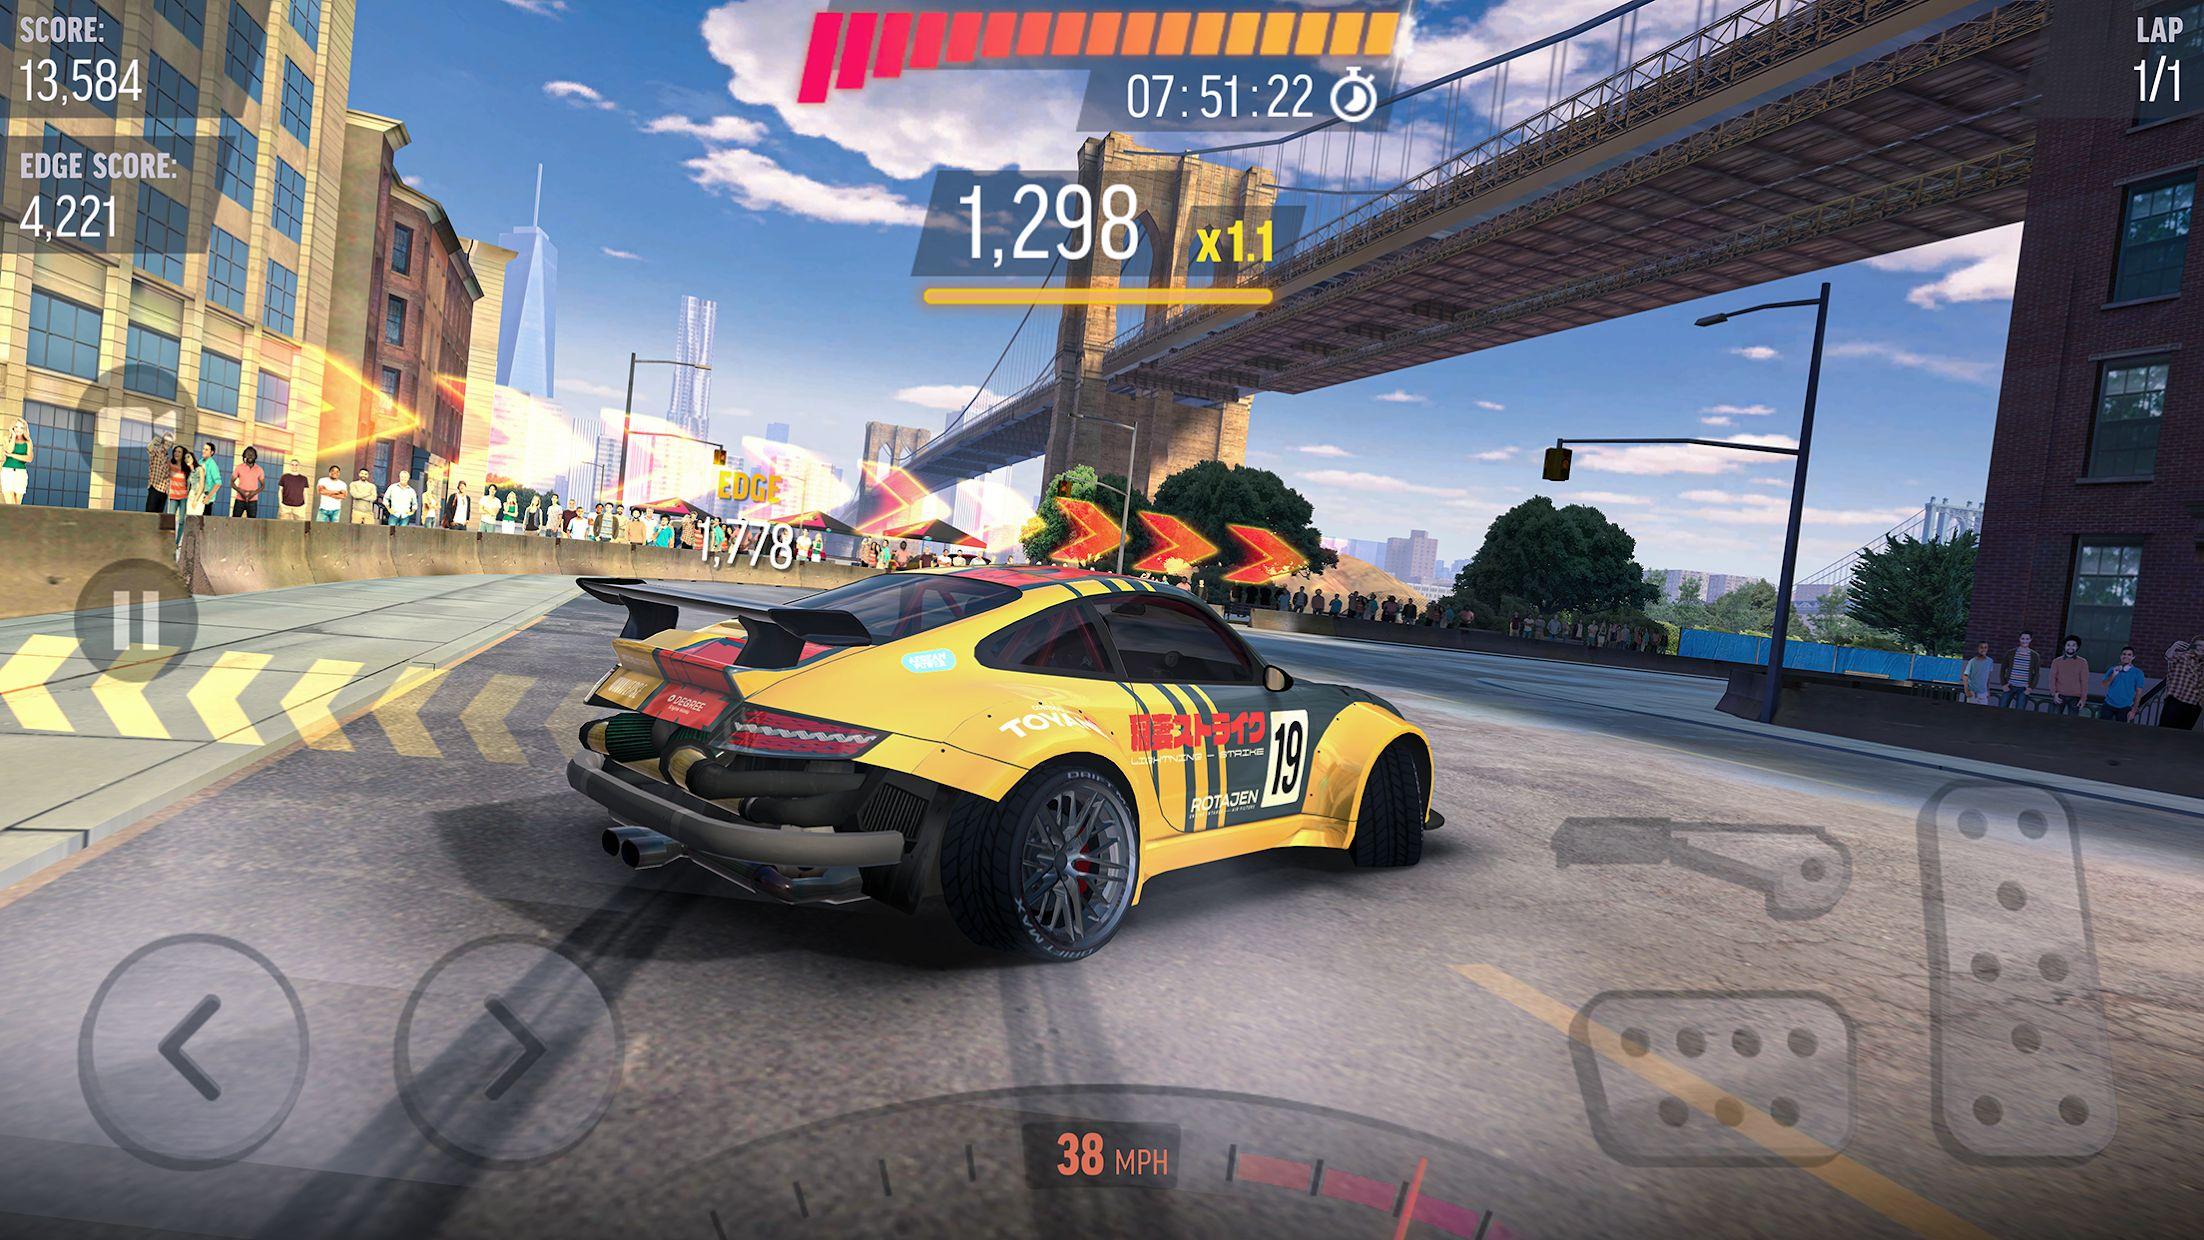 Drift Max Pro (极限漂移专家) - 赛车漂移游戏 游戏截图2